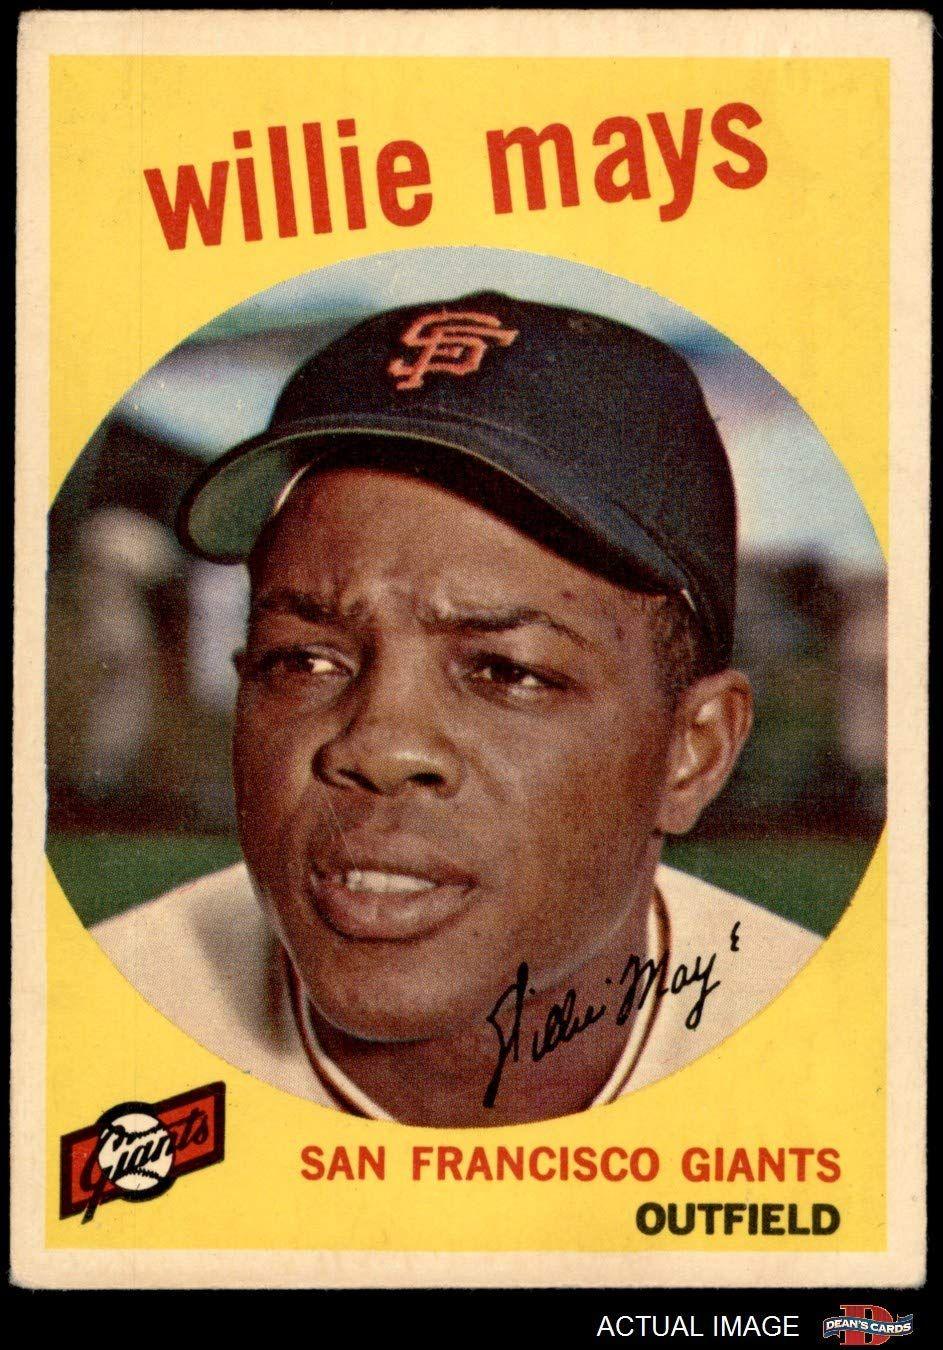 1971 topps baseball cards worth money